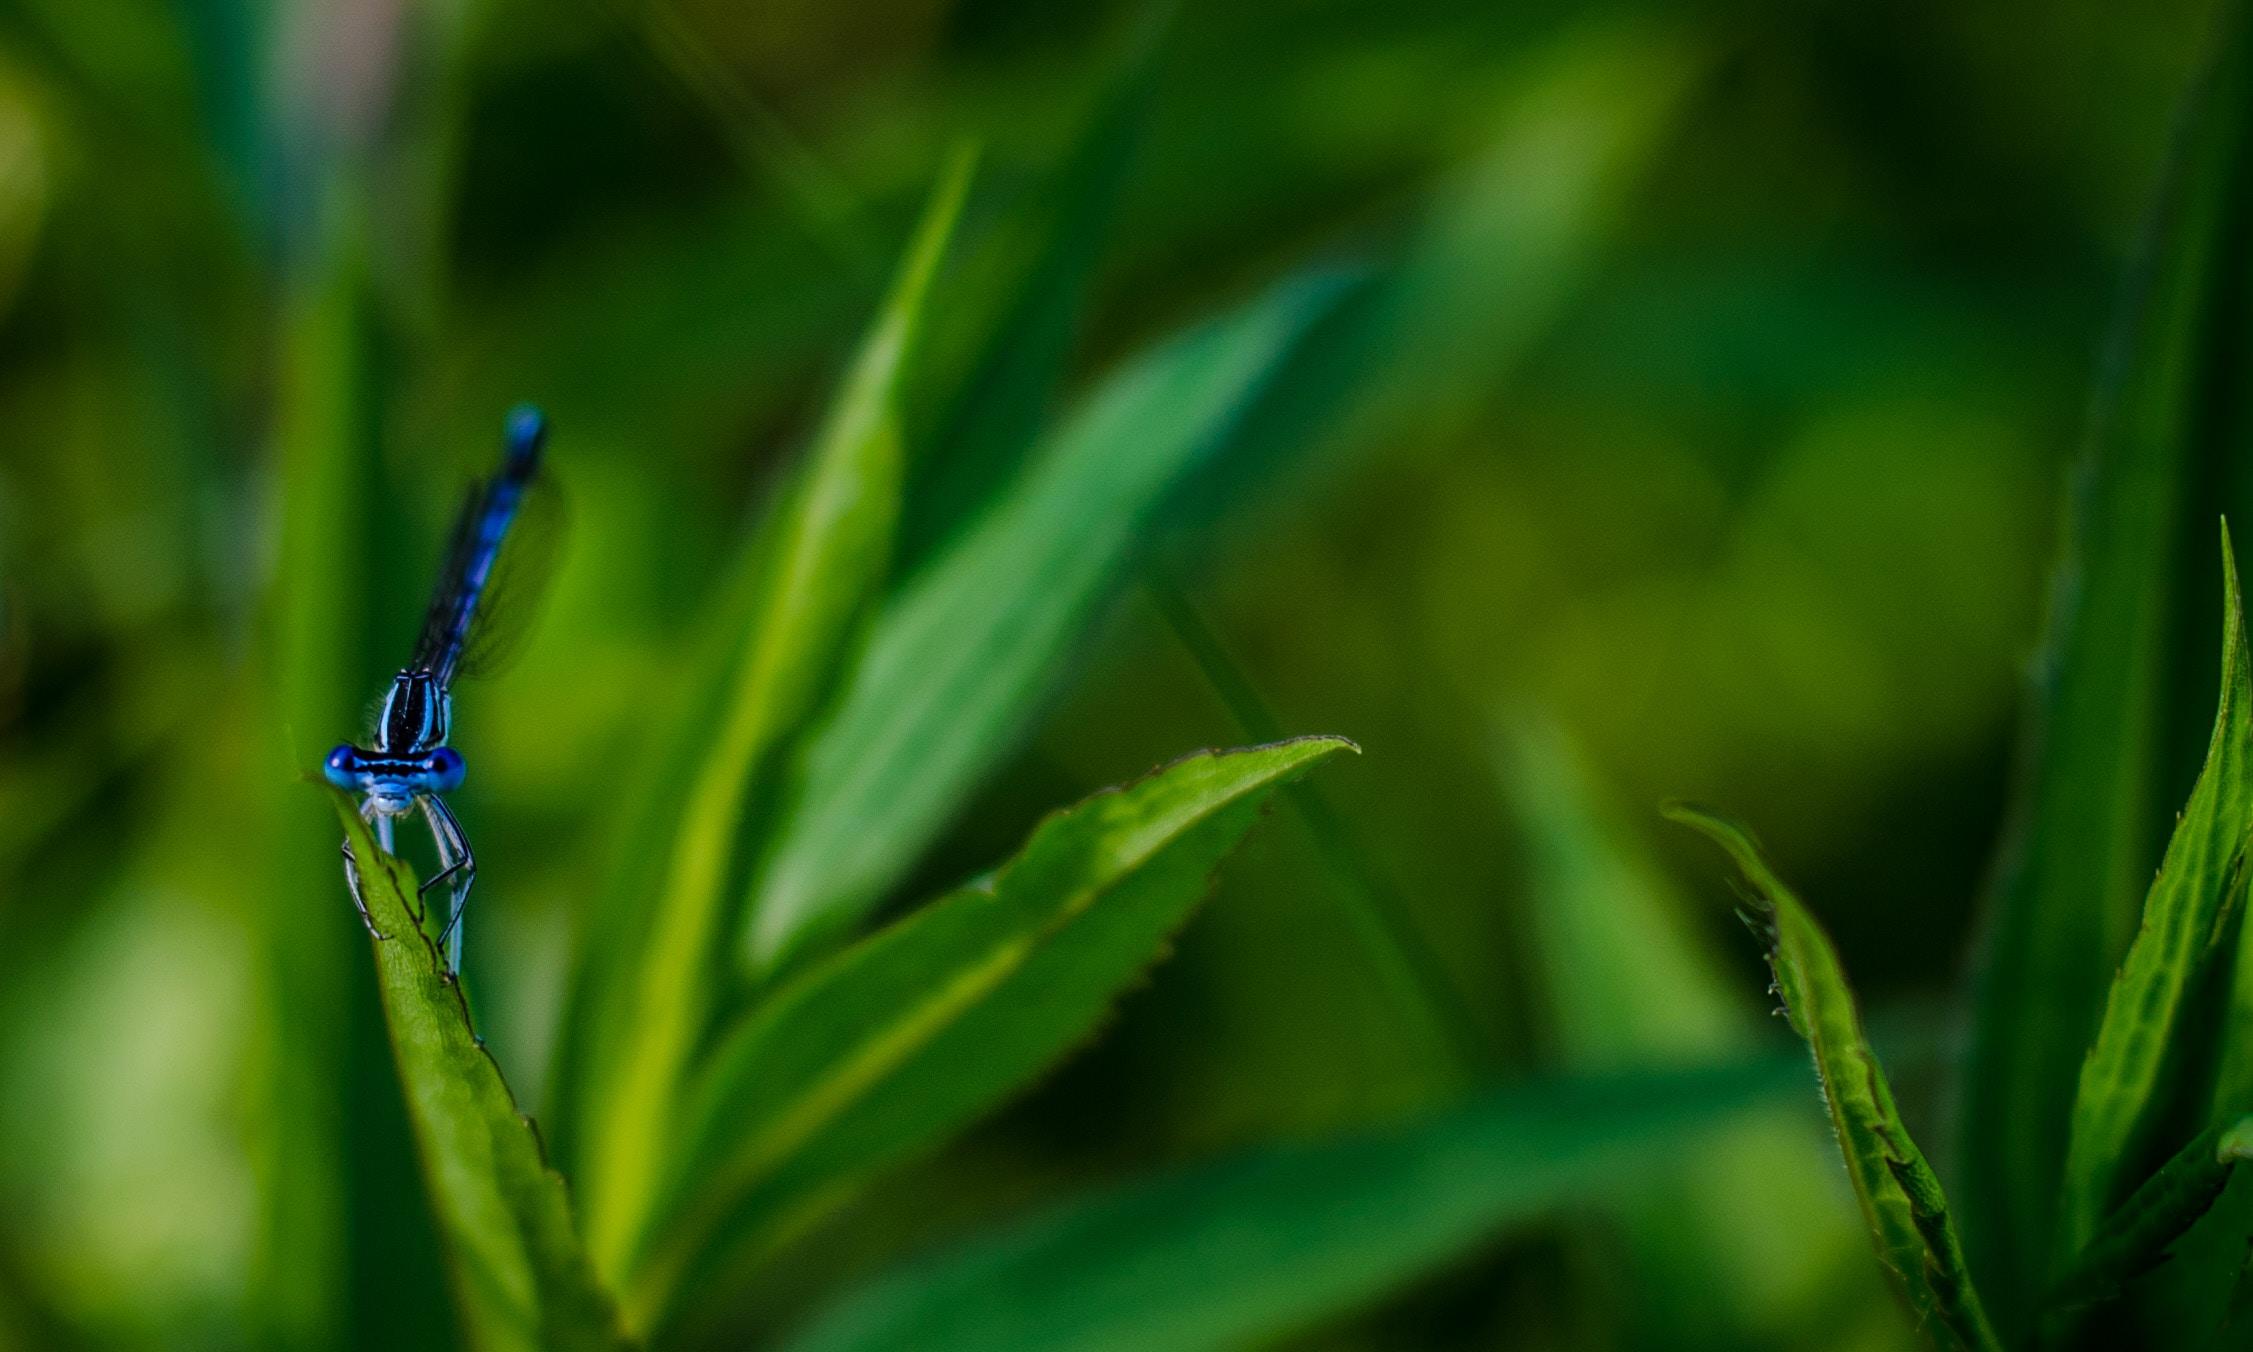 A blue dragonfly clutching a green lance-like leaf